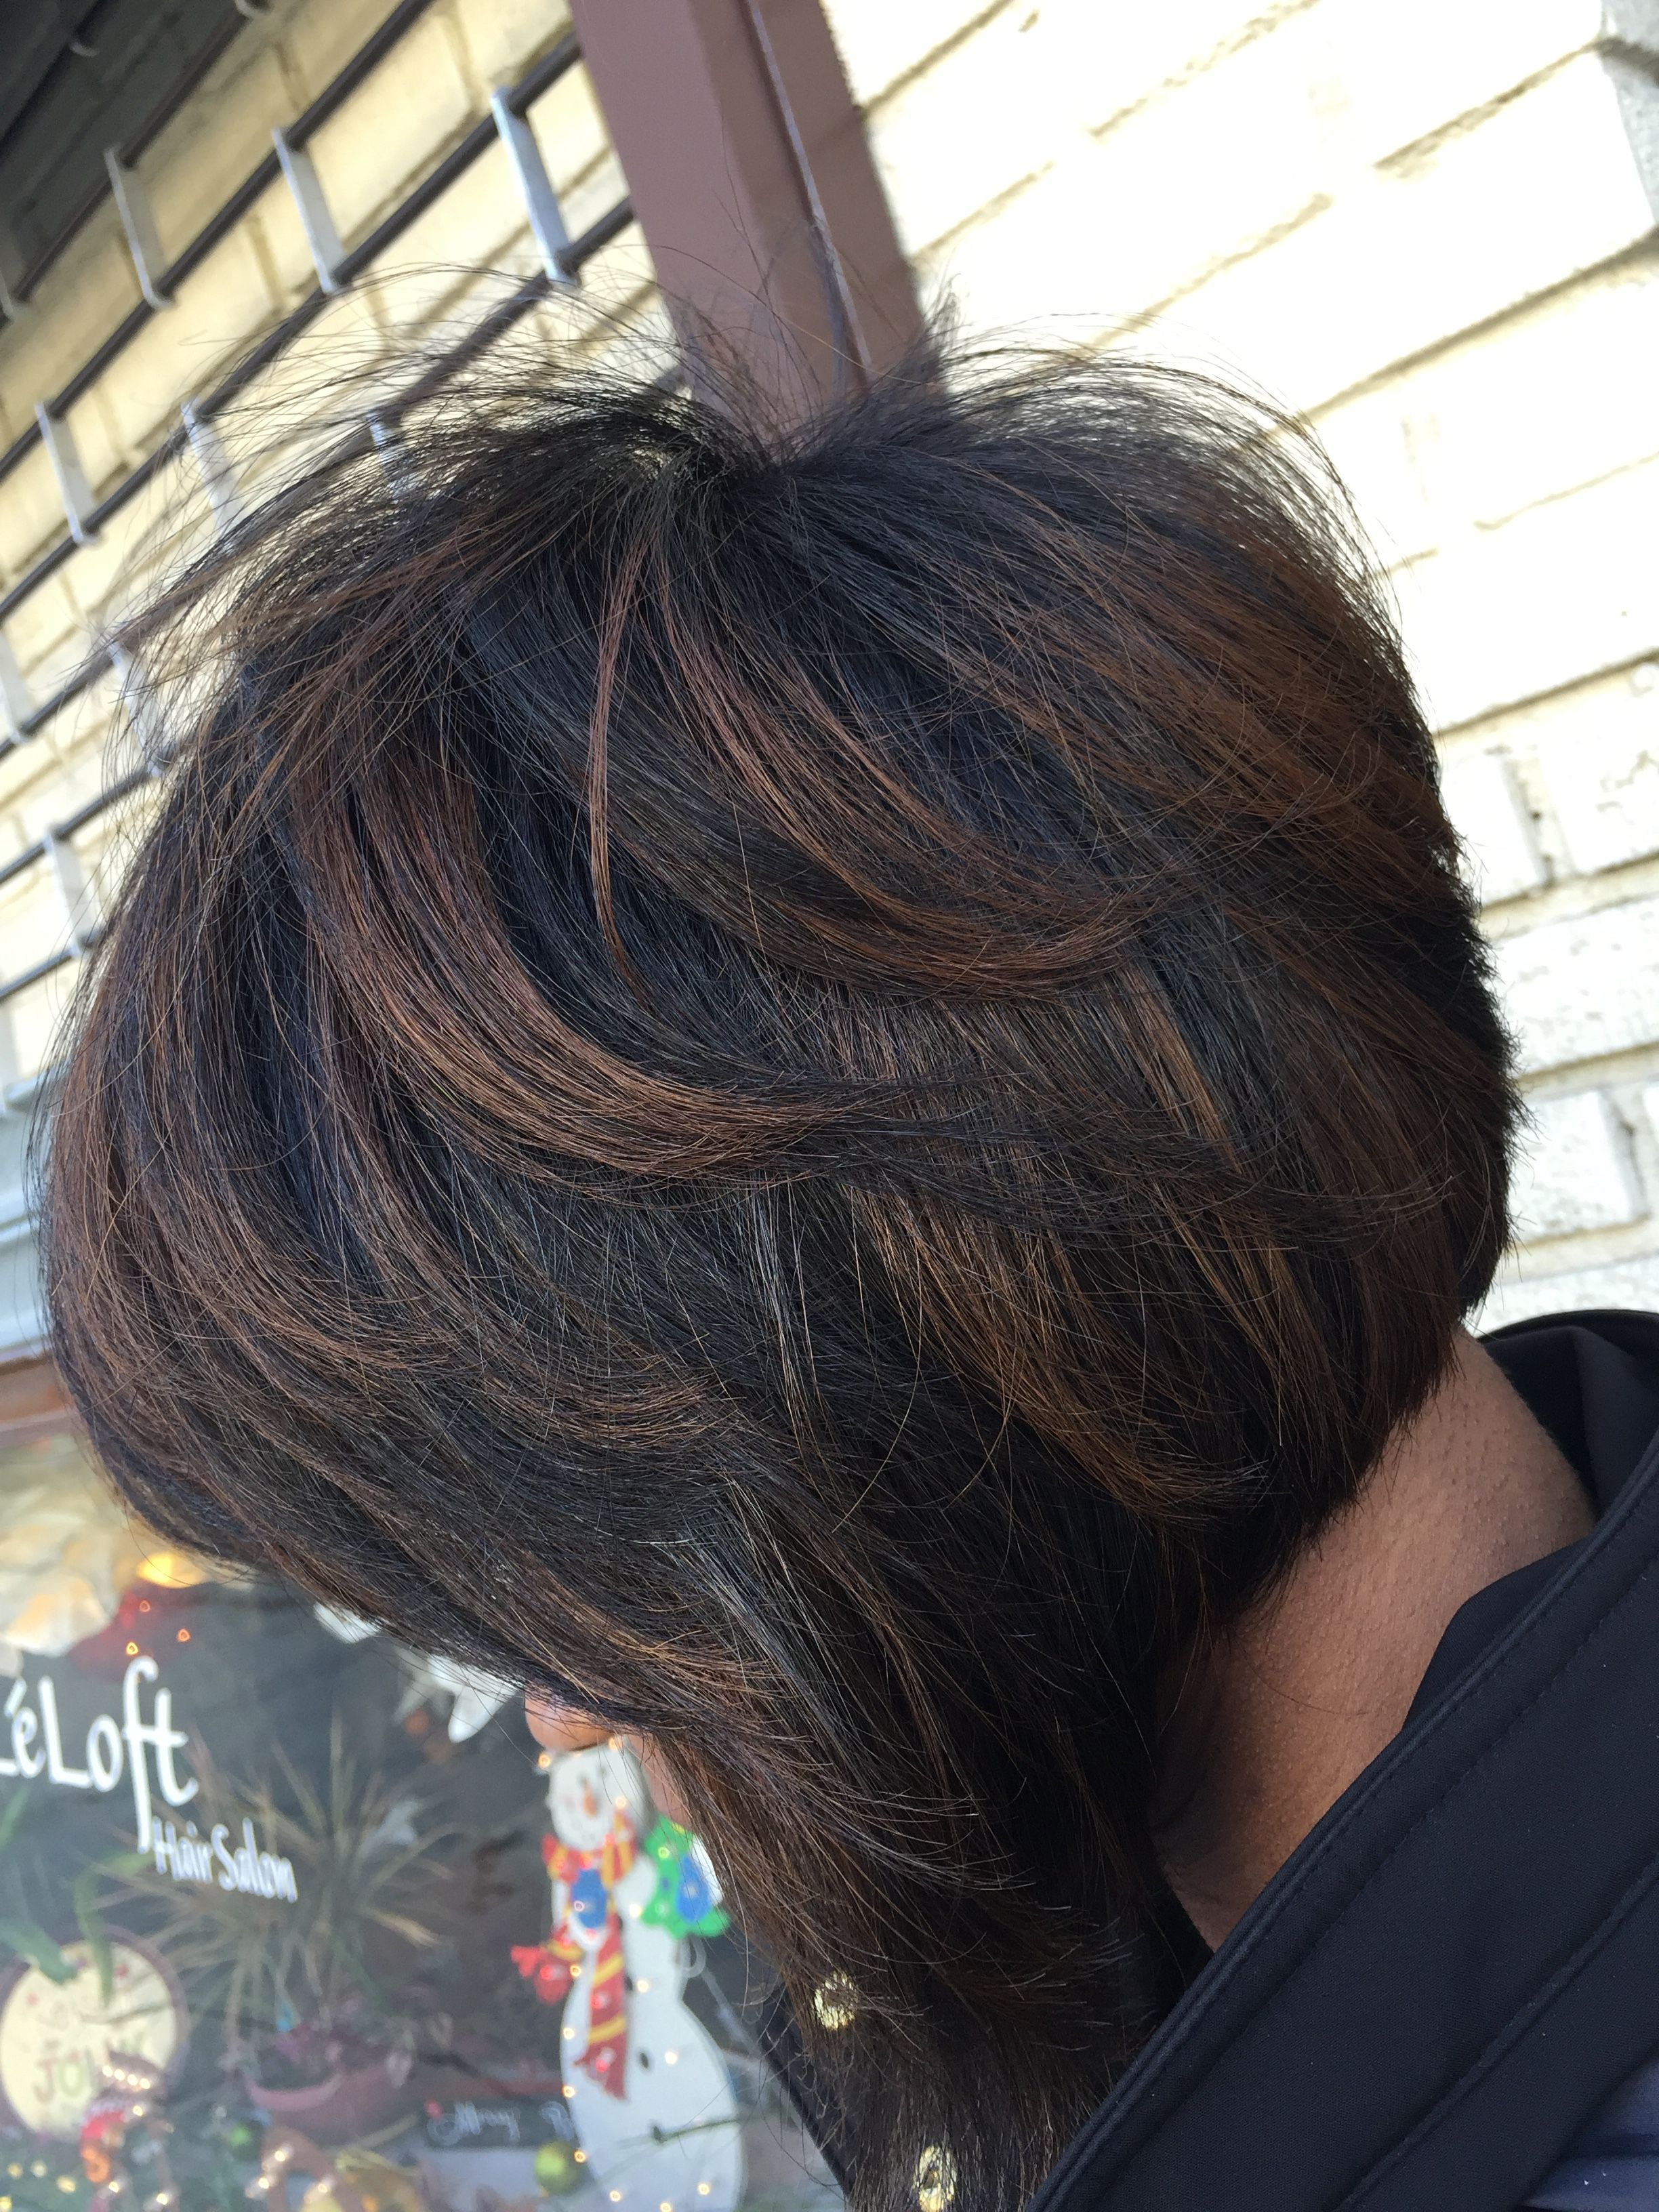 Relaxer Free Hair Stylist Marketia Le Loft Llc Hair Salon Philadelphia Pa Natural Hair Styles Hair Fixing Hair Flow